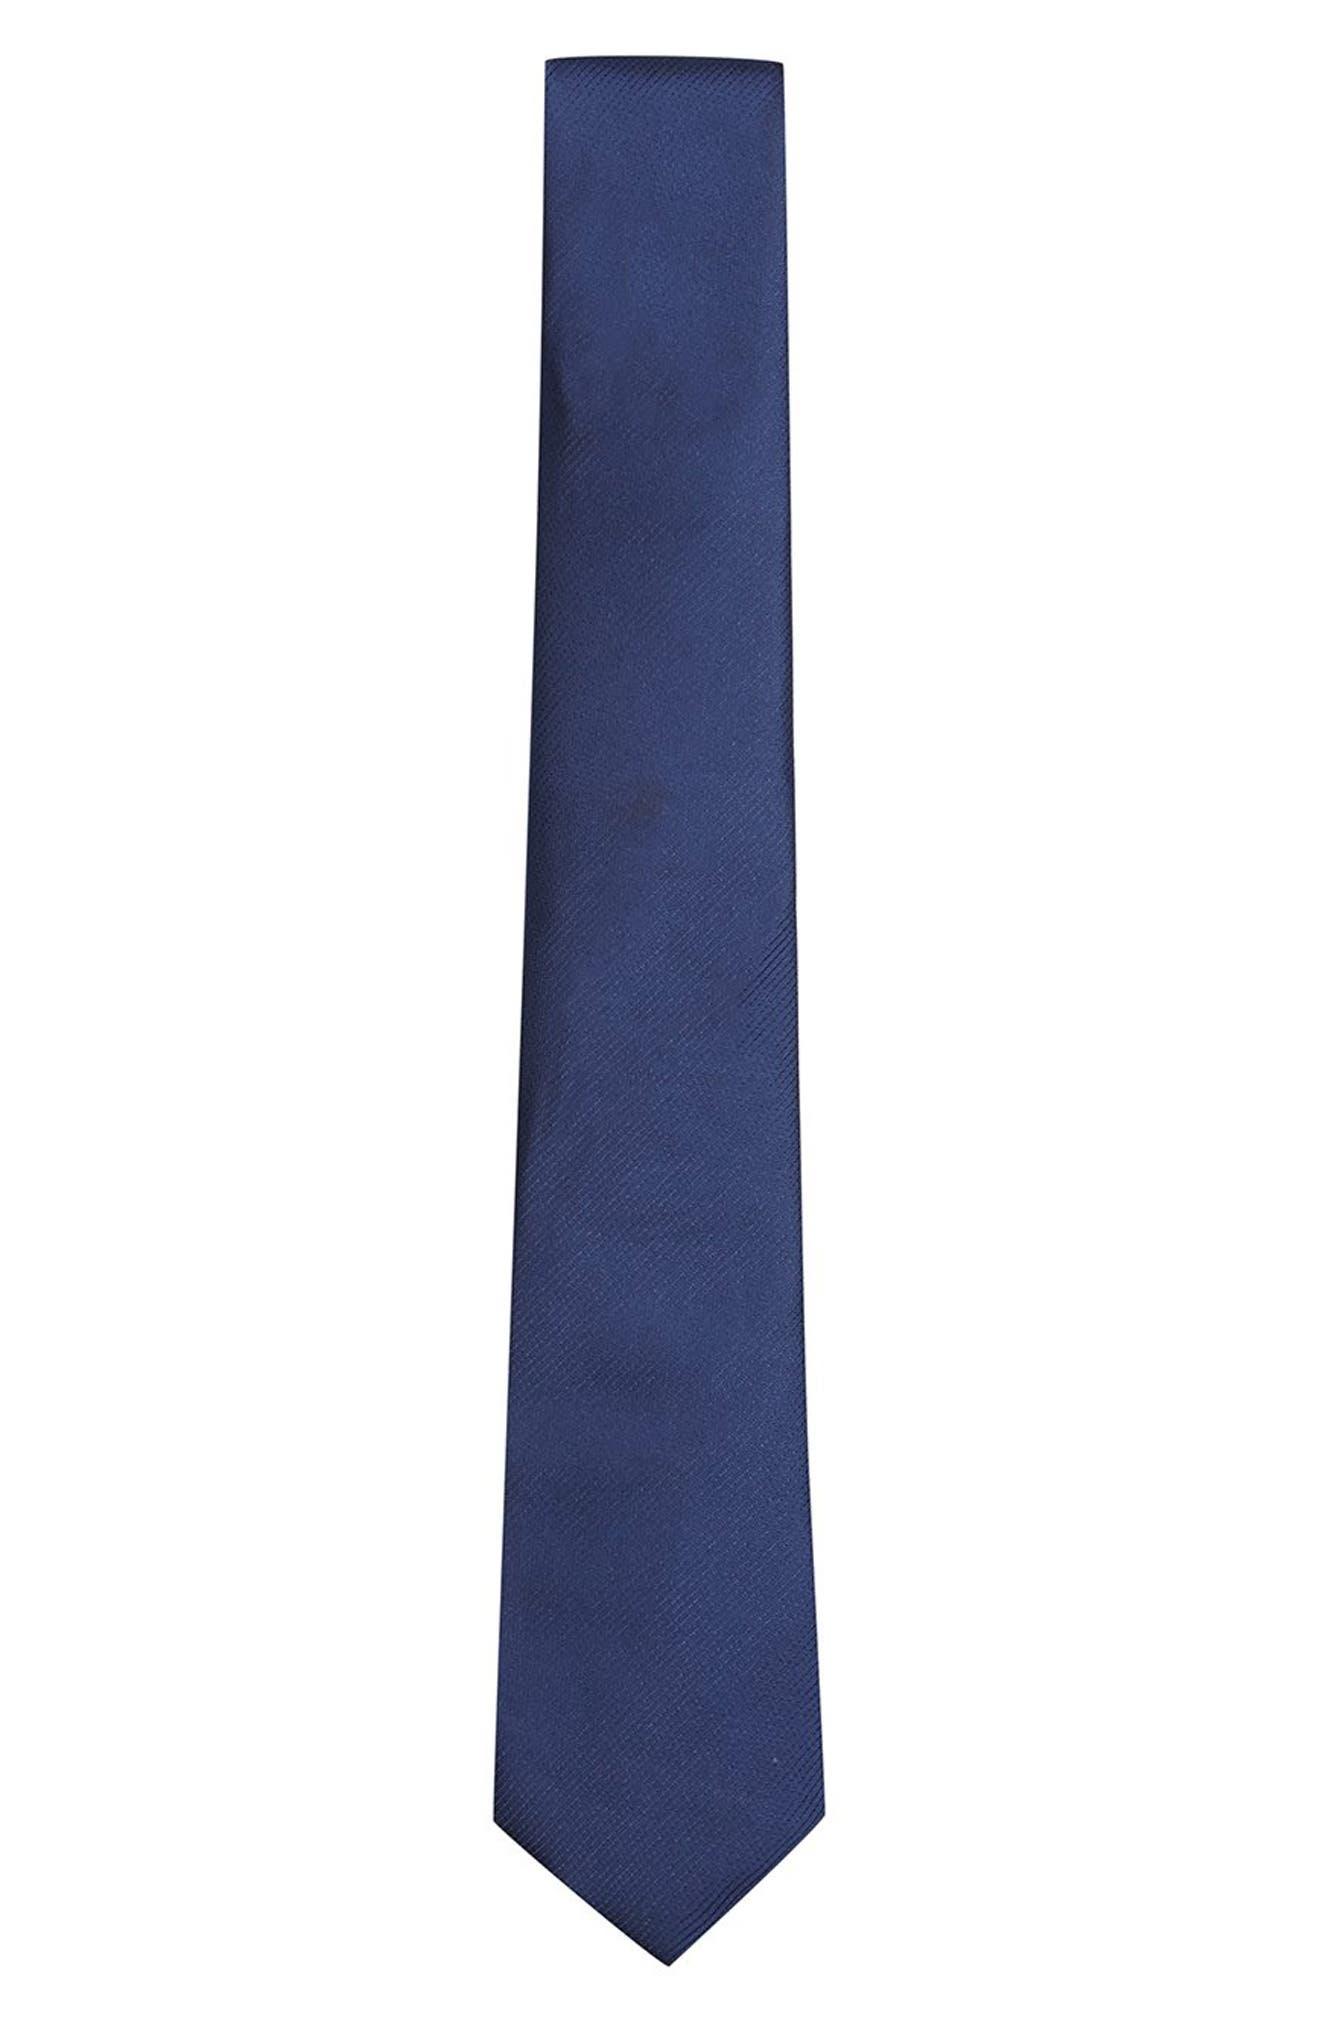 Woven Tie,                         Main,                         color, NAVY BLUE